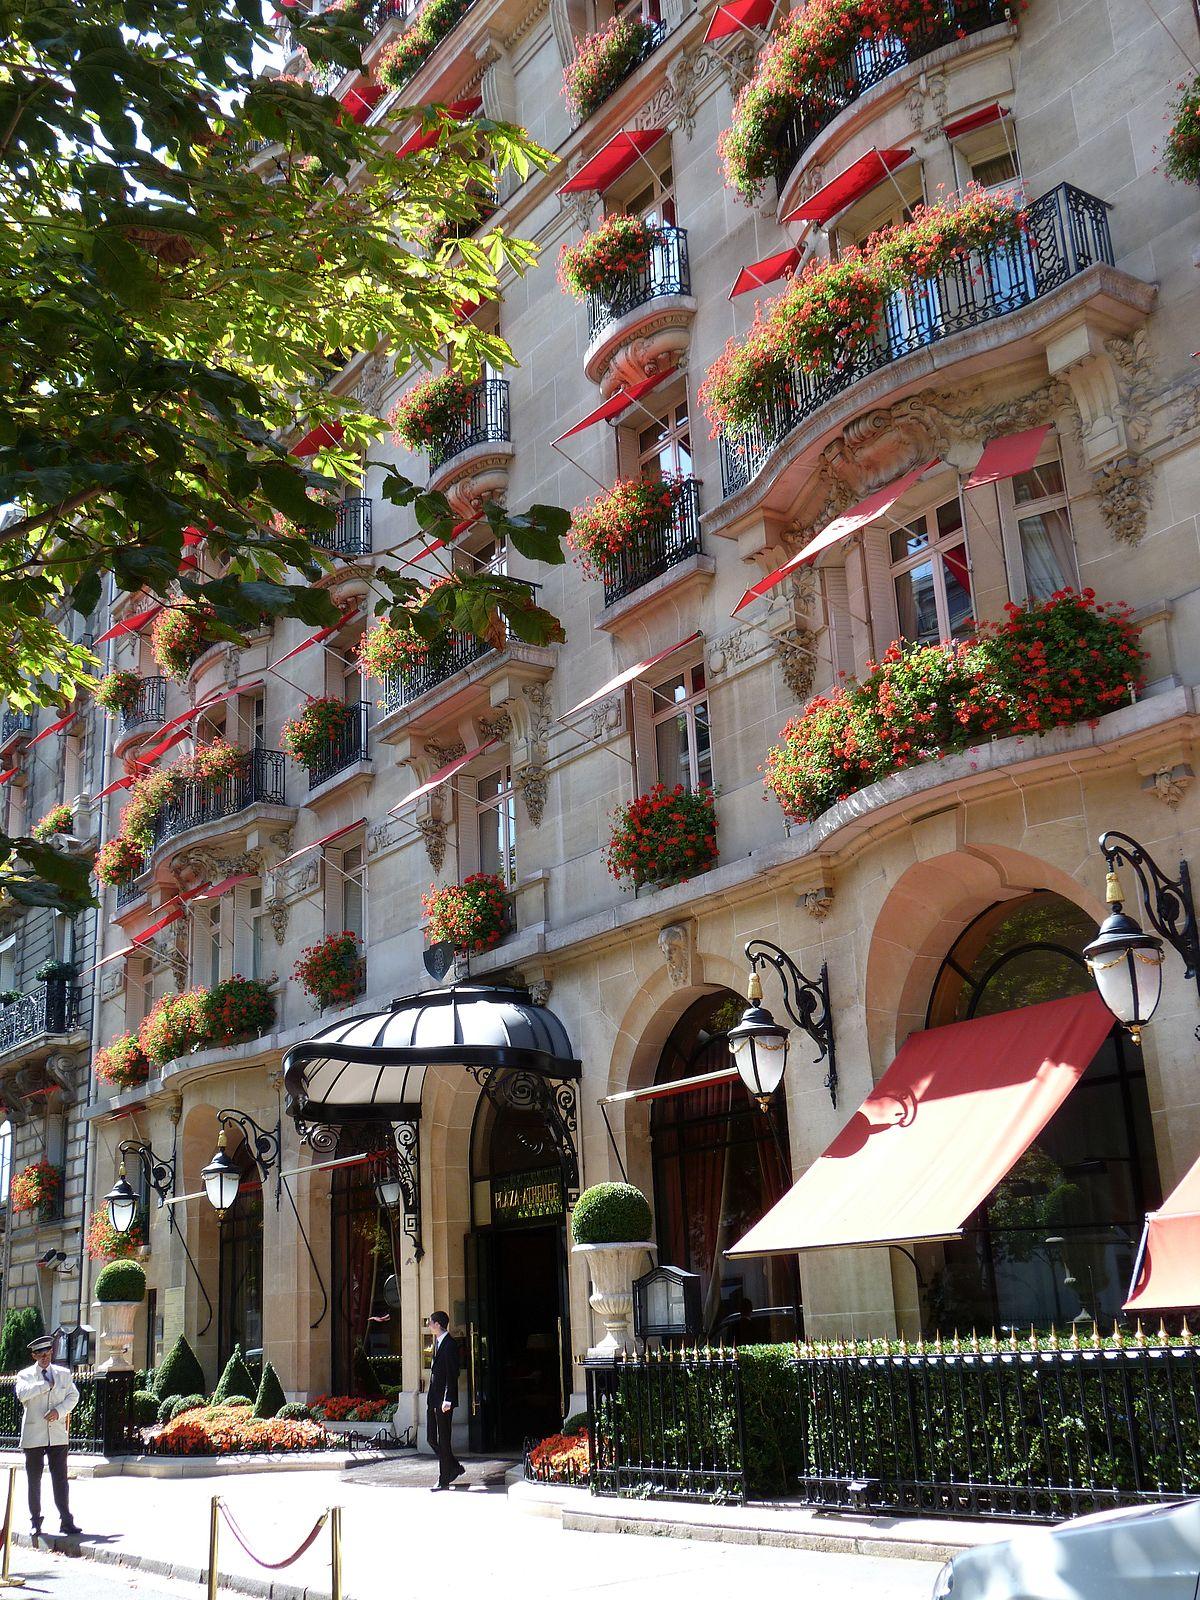 Hotels Restaurants Dans Le Doubs Animaux Accept Ef Bf Bds